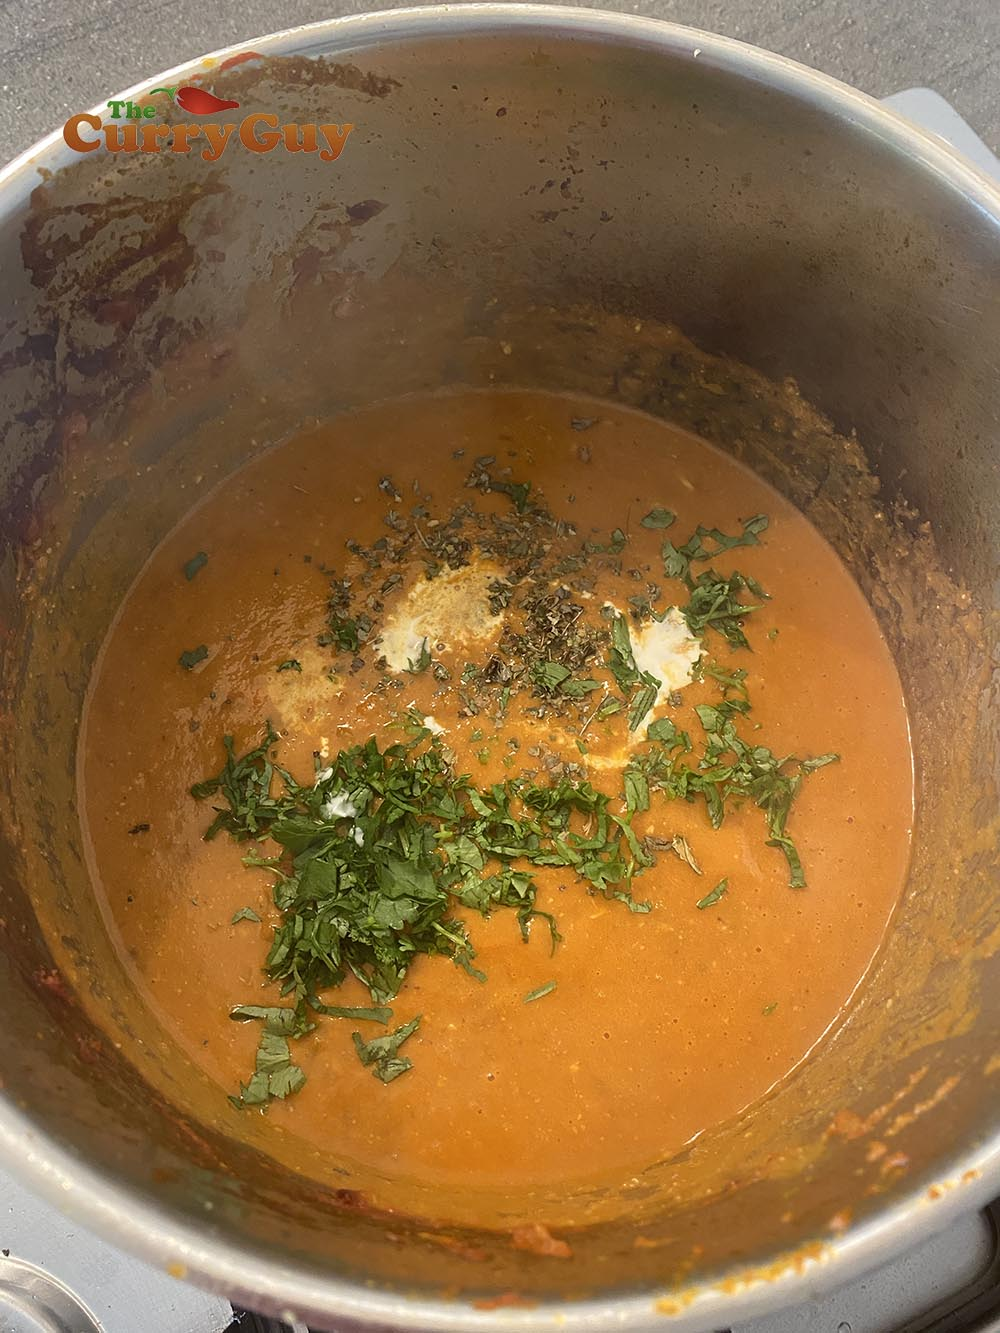 Adding fenugreek, coriander and cream